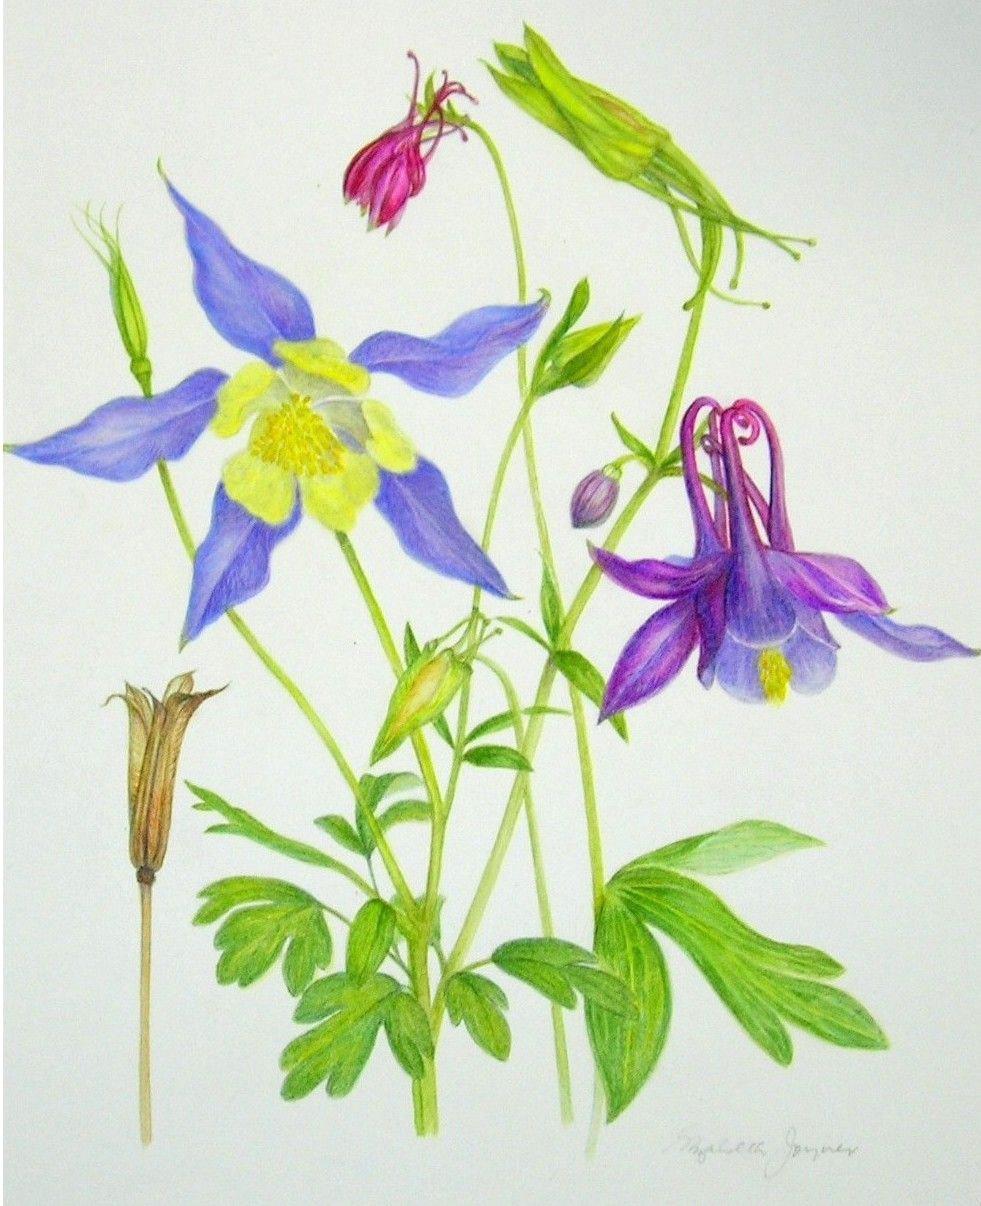 columbine colorado state flower